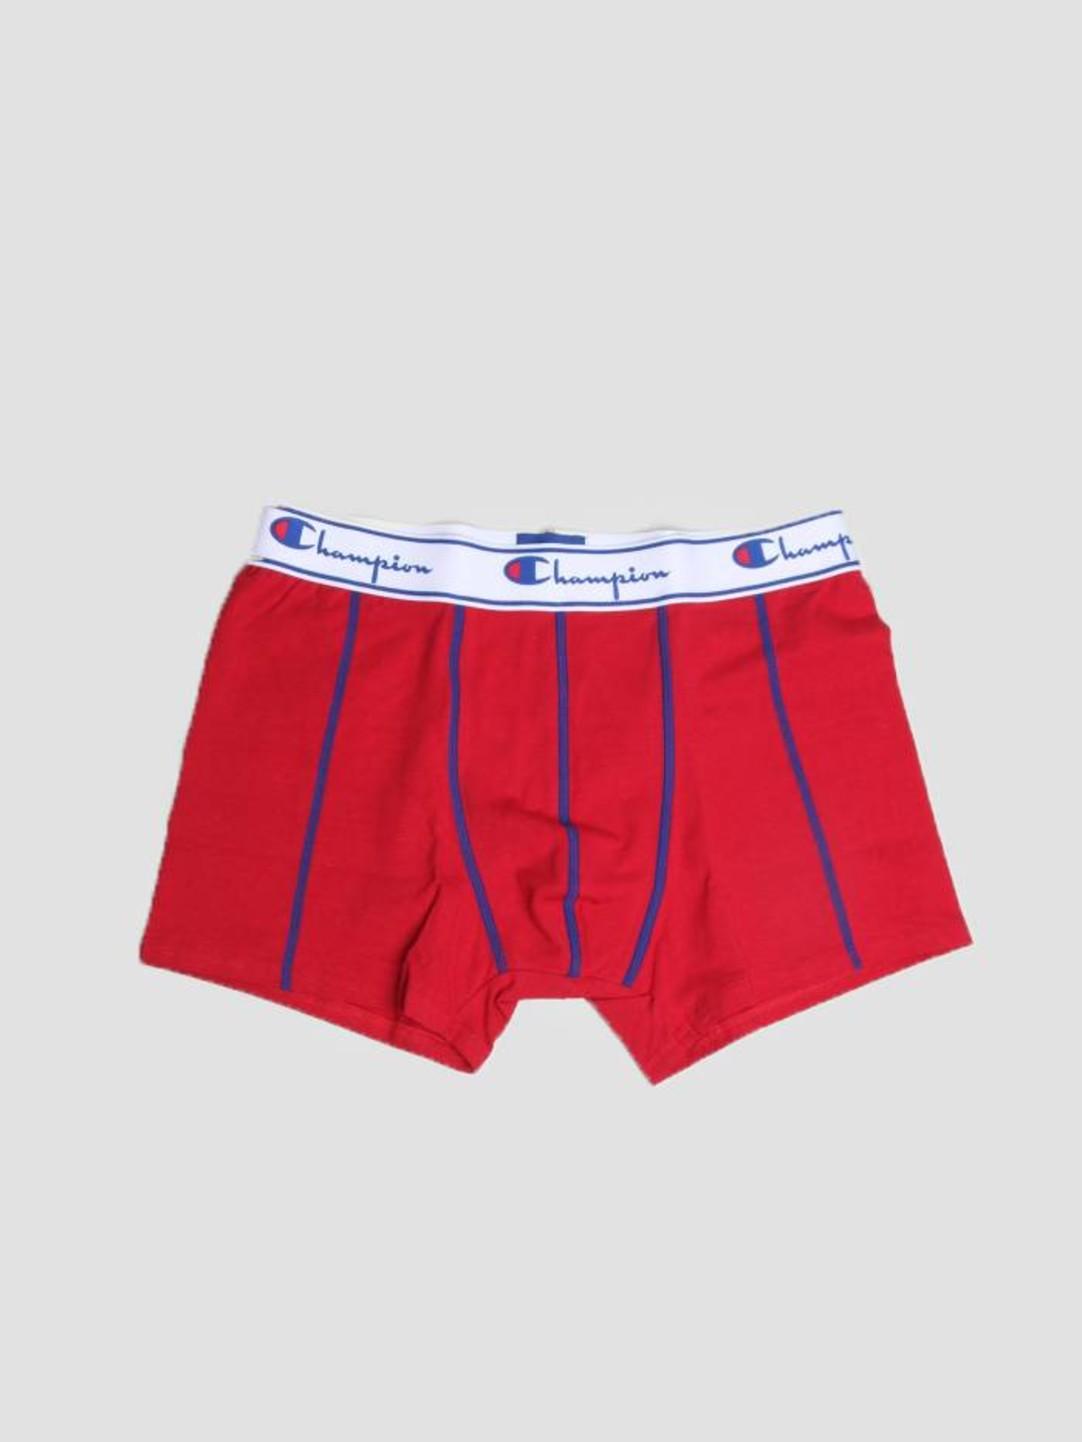 Champion Champion Boxer Cotton Red Royal Blue 372001